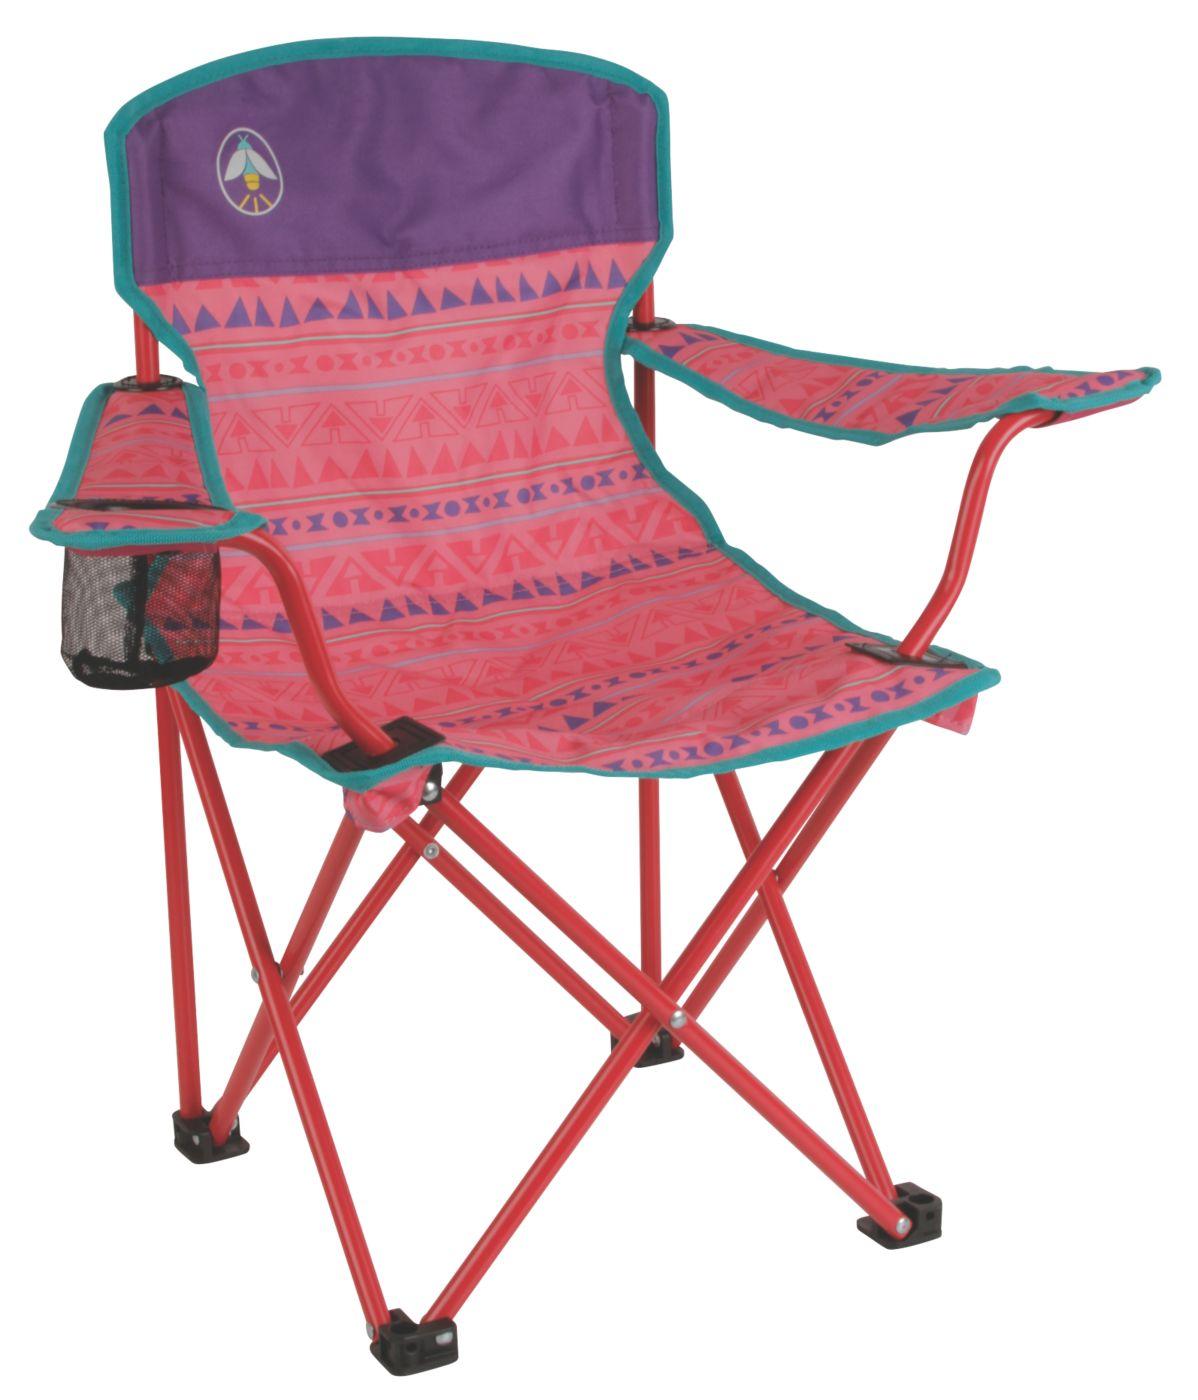 Coleman® Kids Quad Chair  sc 1 st  Coleman & Camping Chair|Coleman islam-shia.org